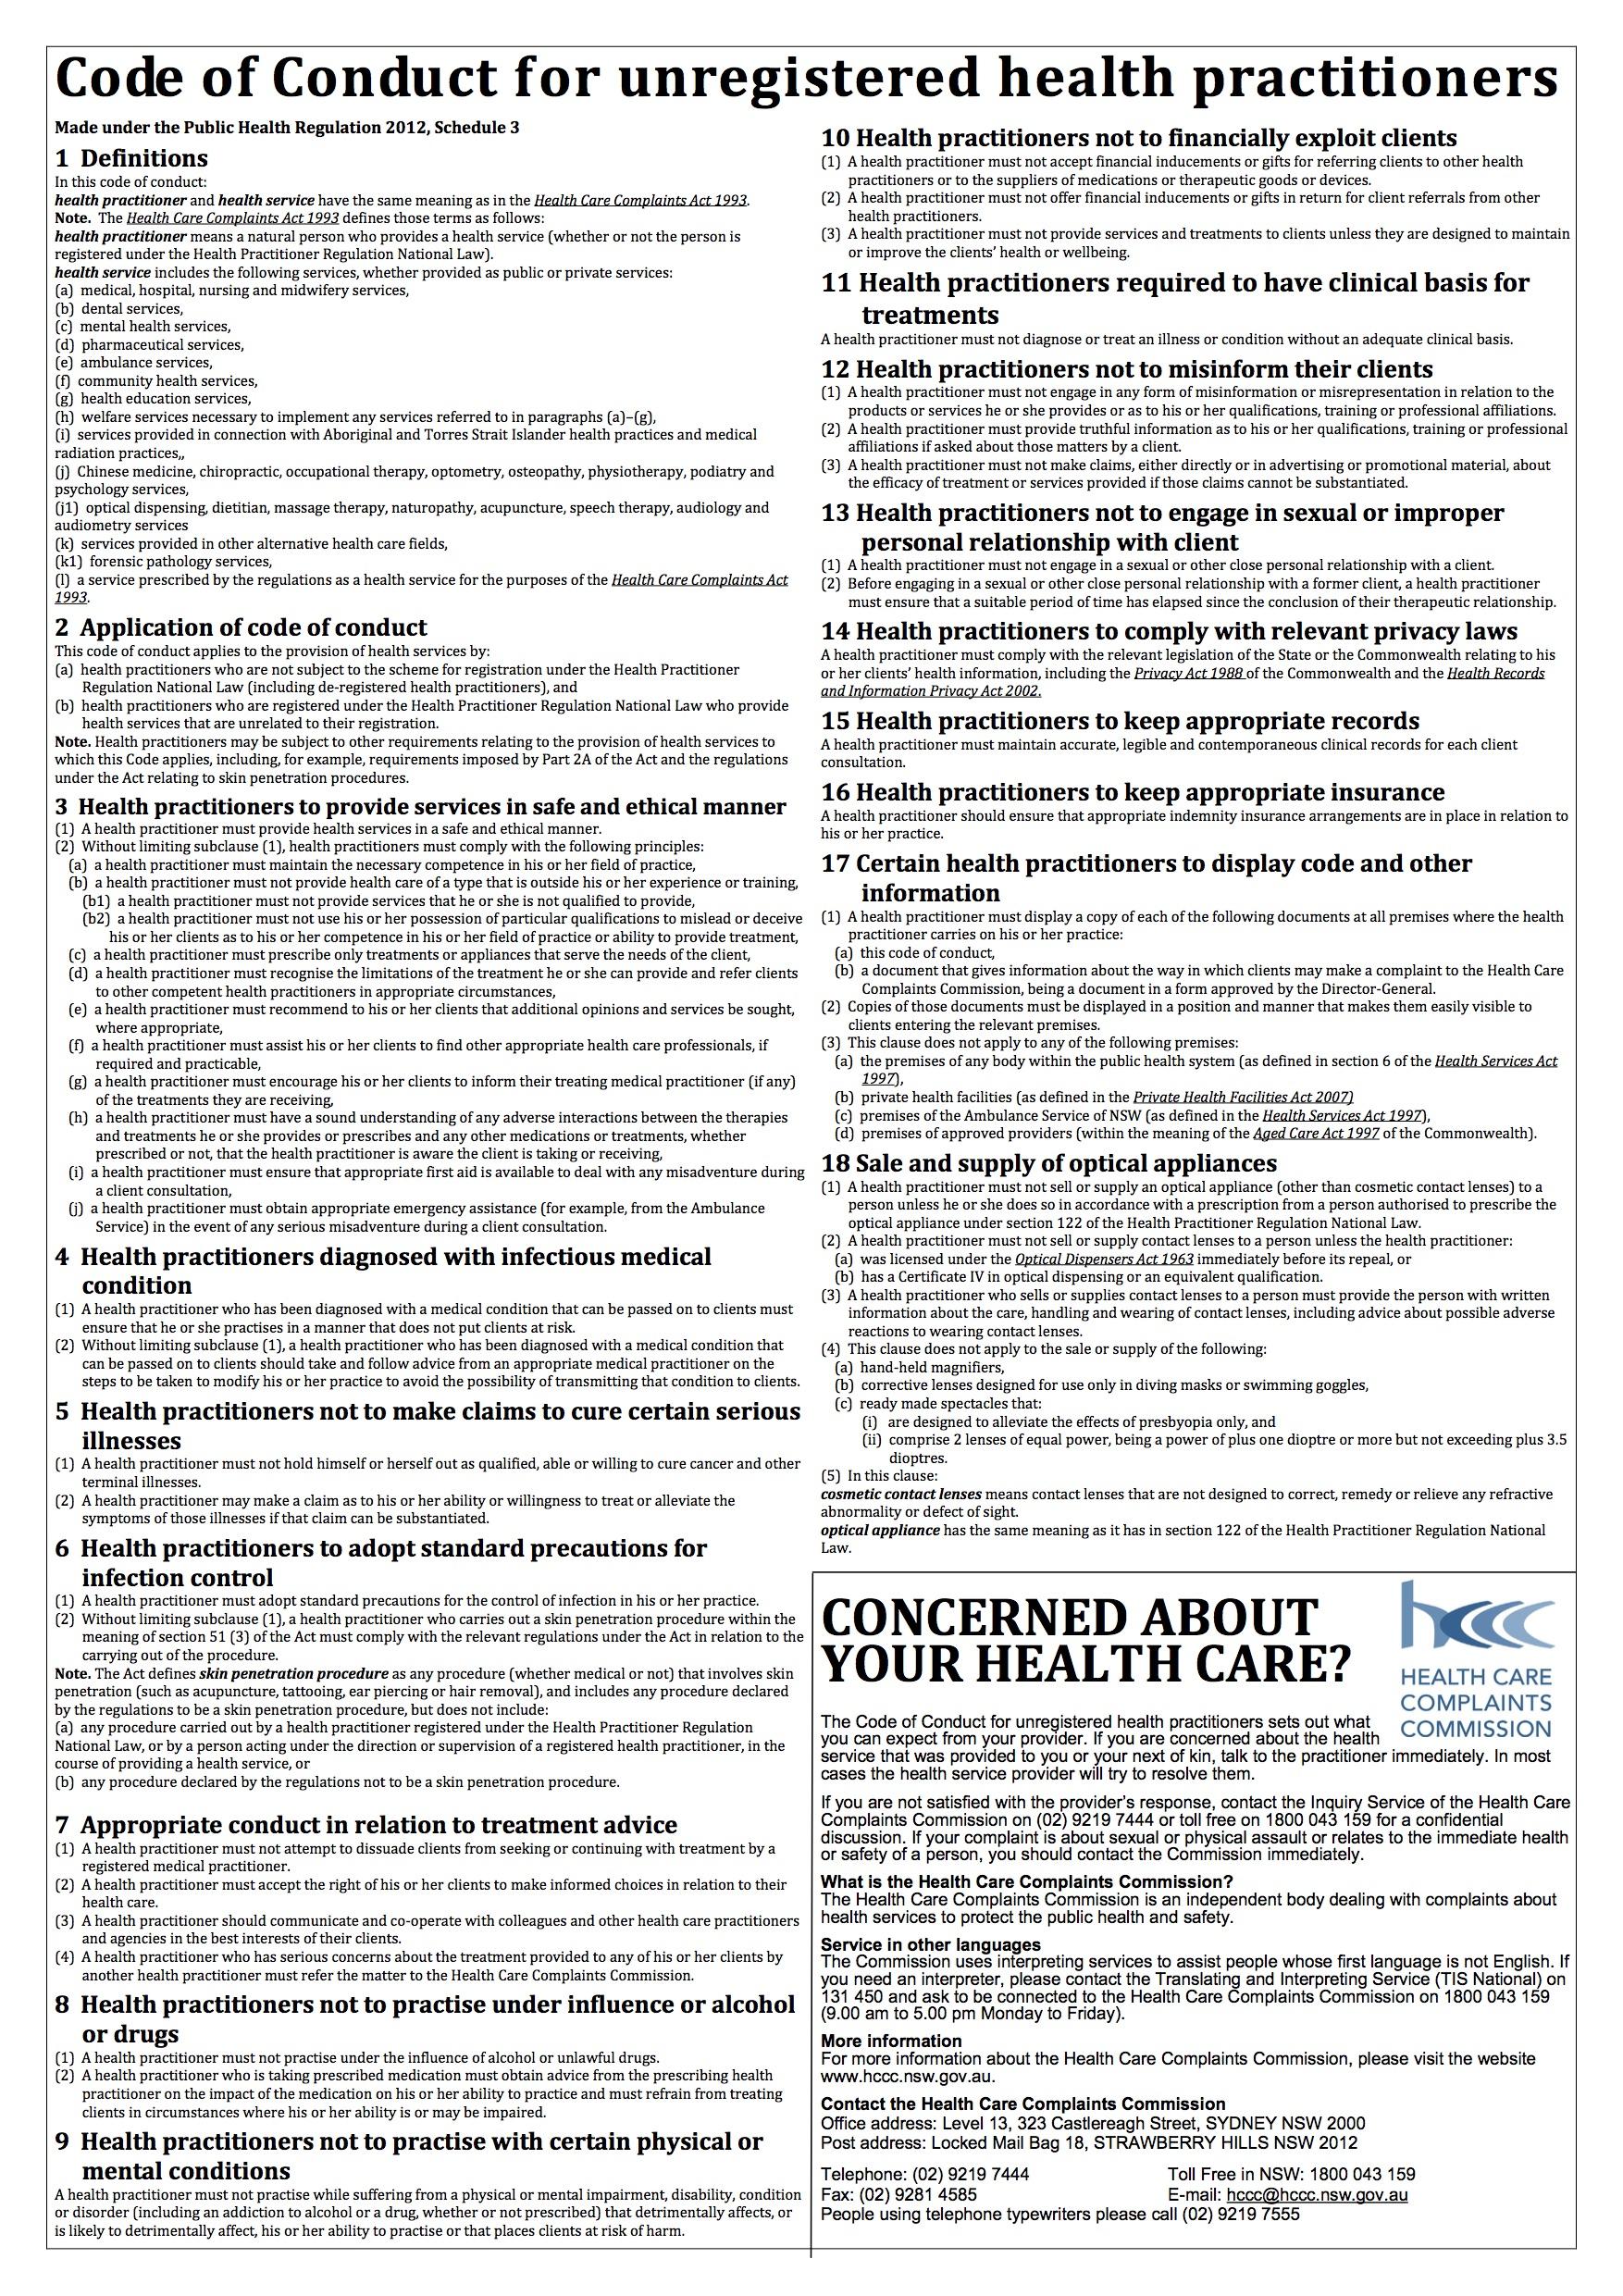 Code of Conduct 2012.jpg